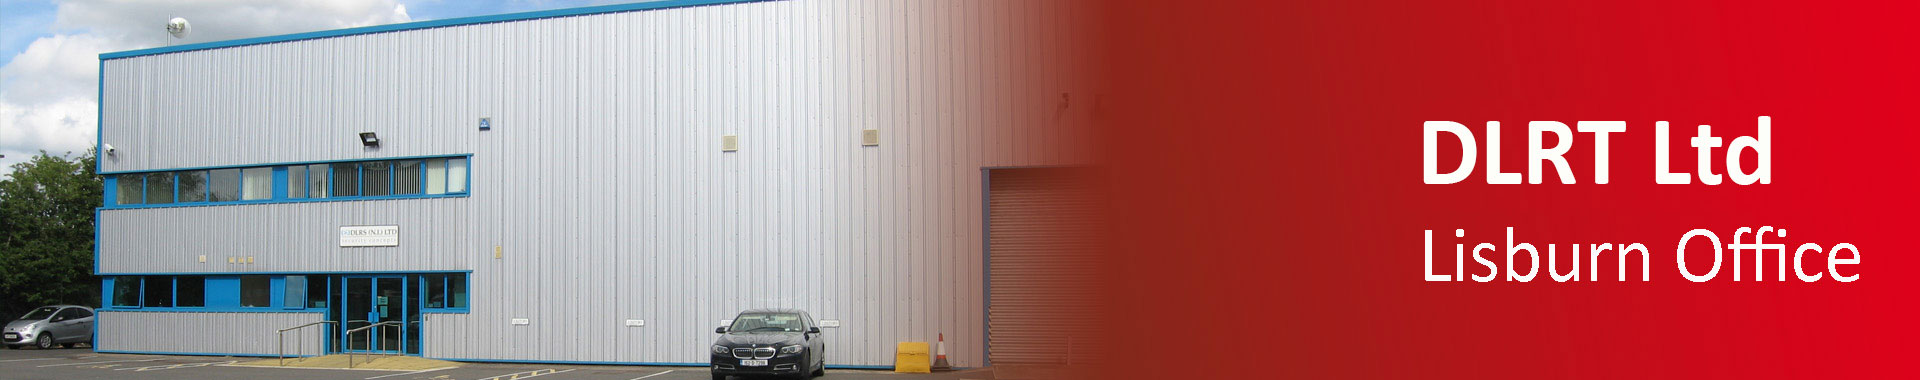 DLRT Ltd Lisburn